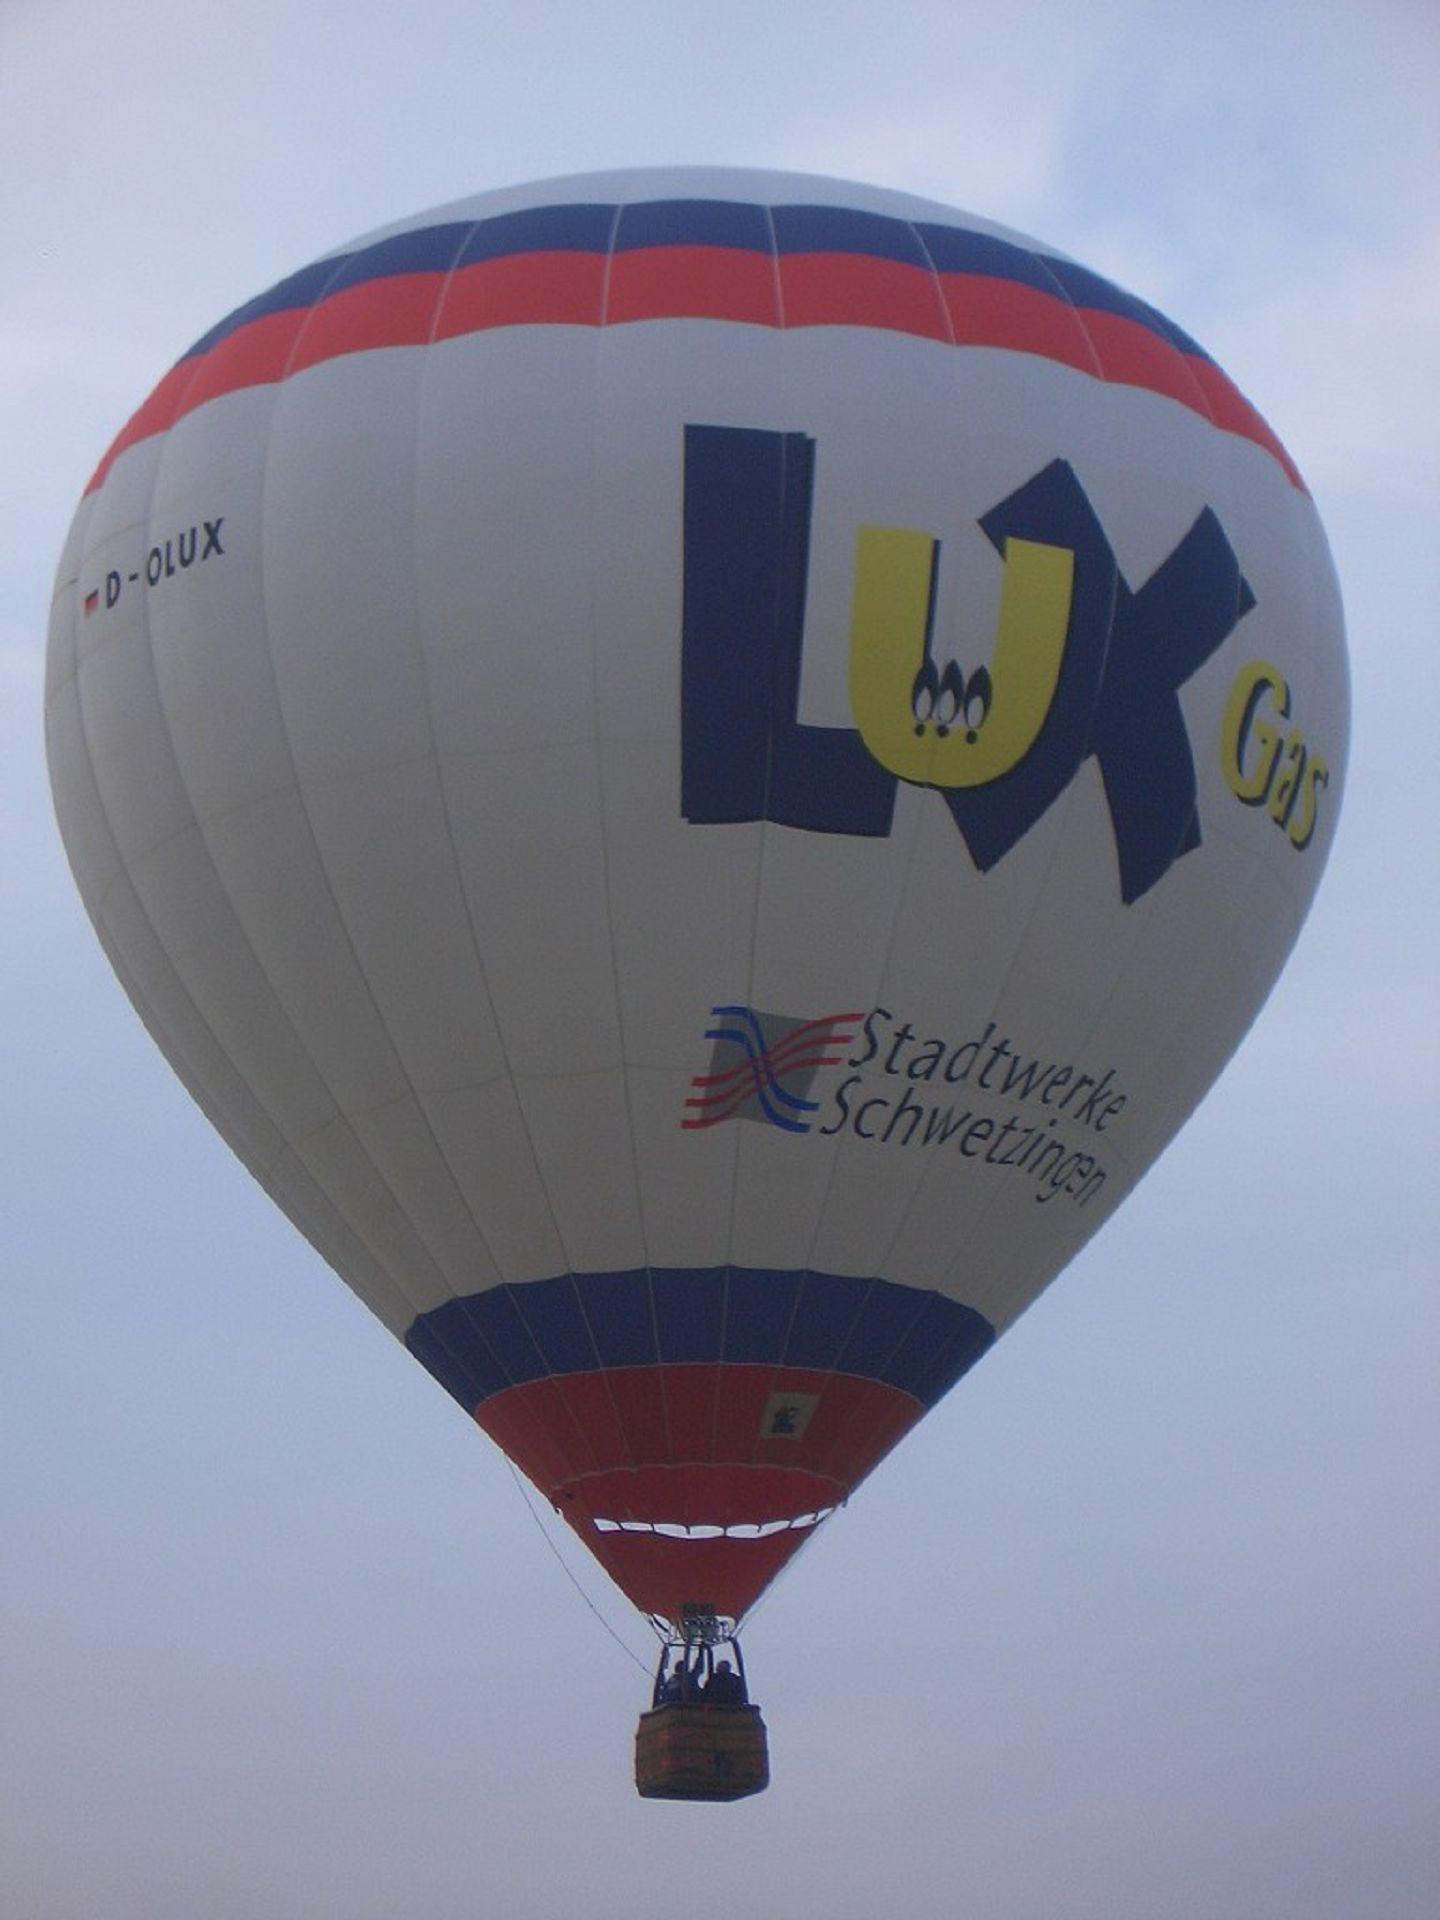 Mein_Ballon_D-OLUX_06